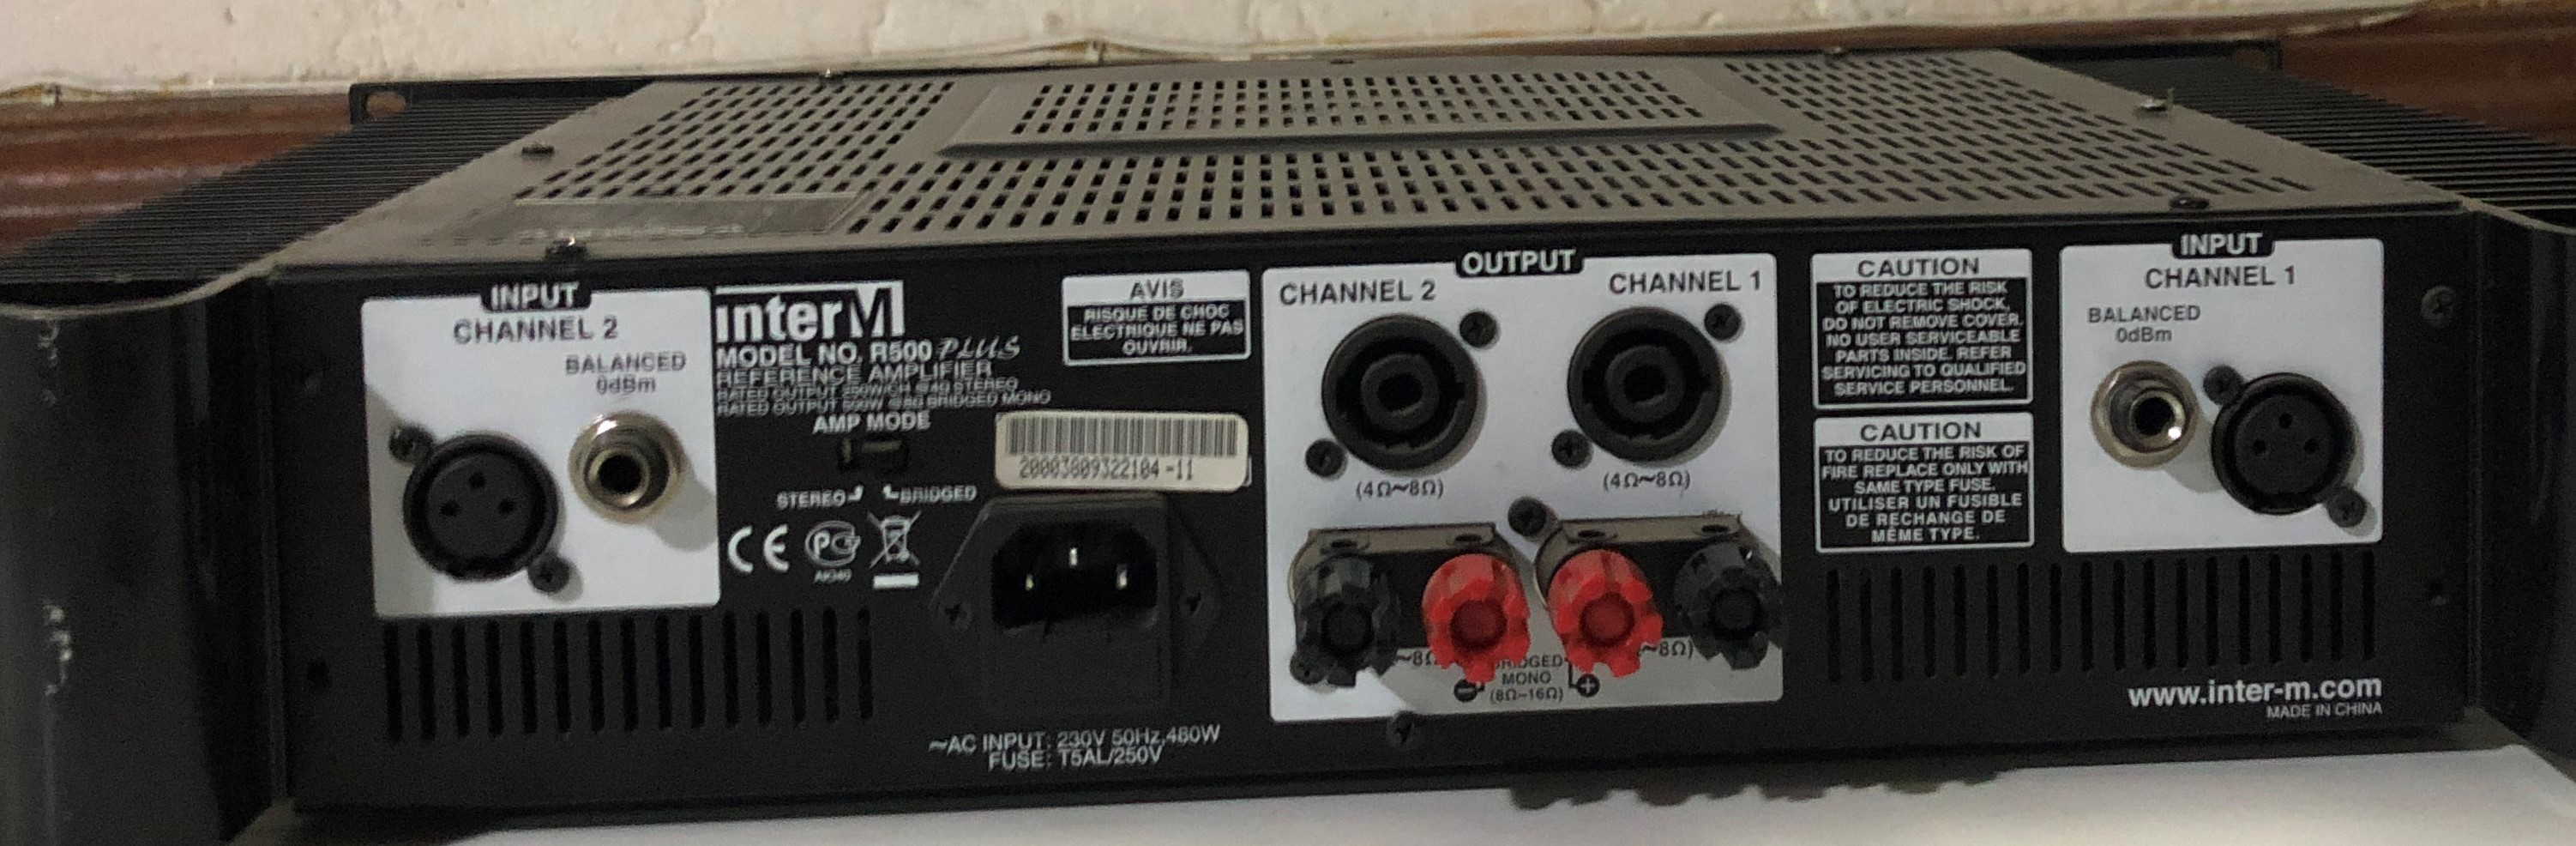 InterM R500 Reference Amplifier 250W + 250W 4ohm